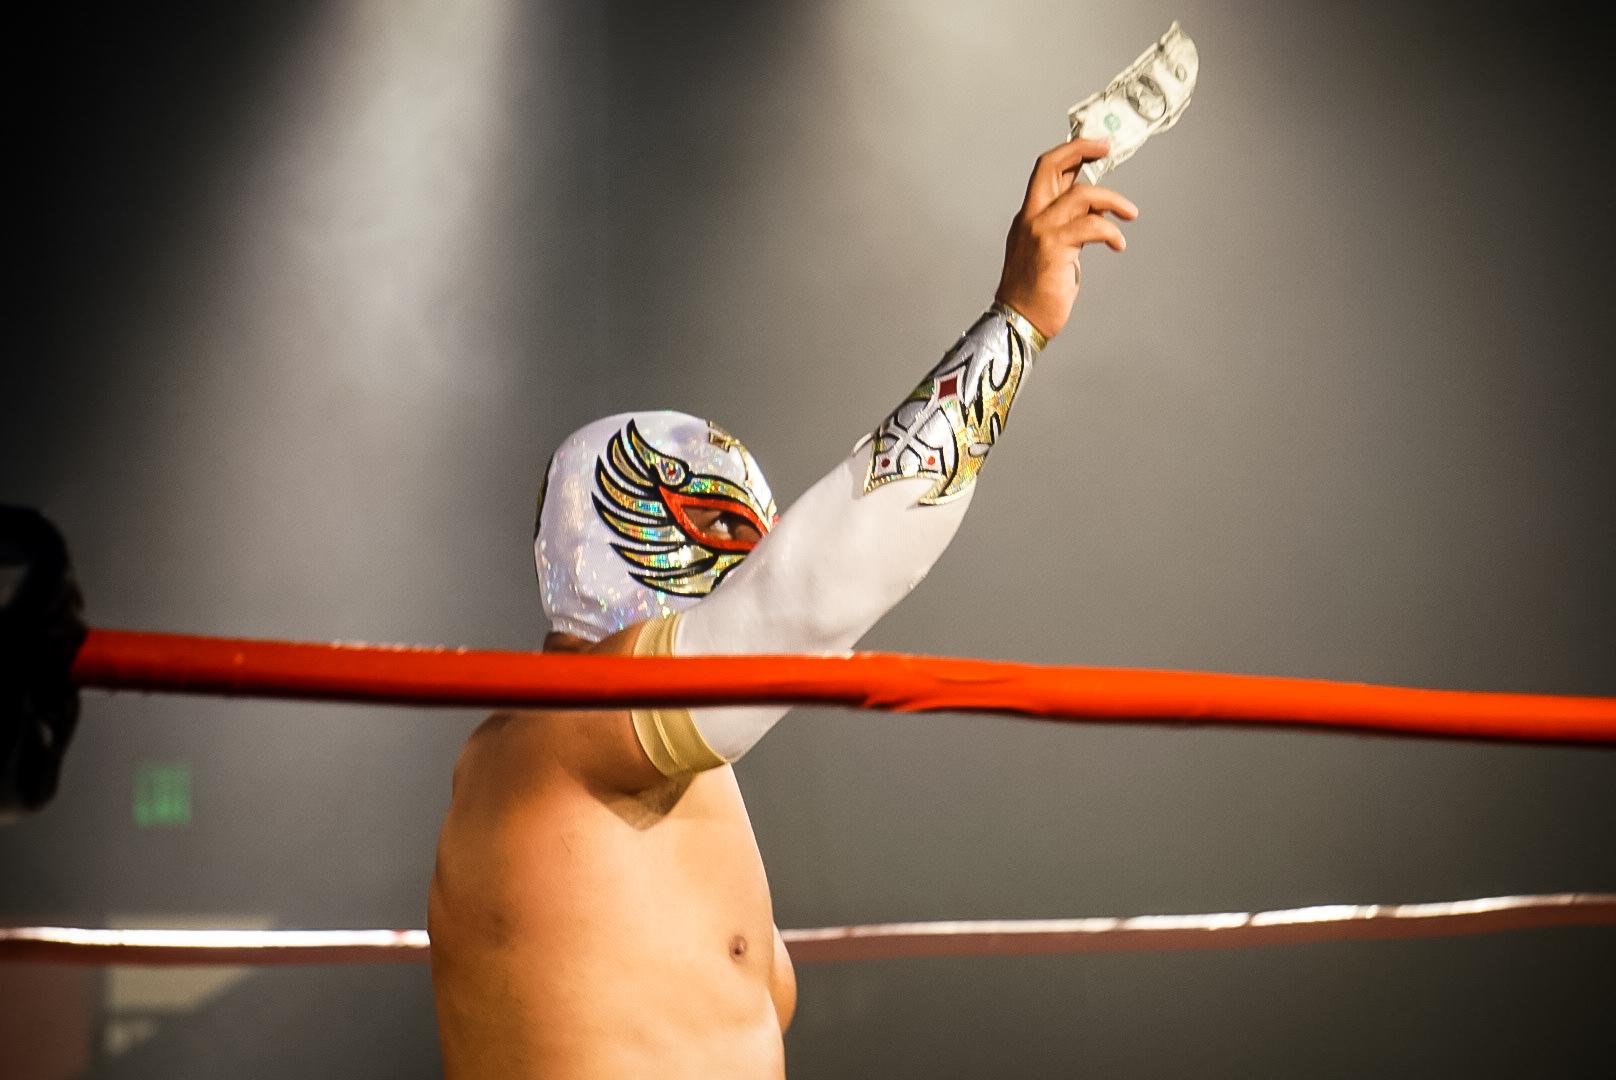 Scenes from Caristico vs. Dragon Lee in Pro Wrestling Revolution in San Jose.